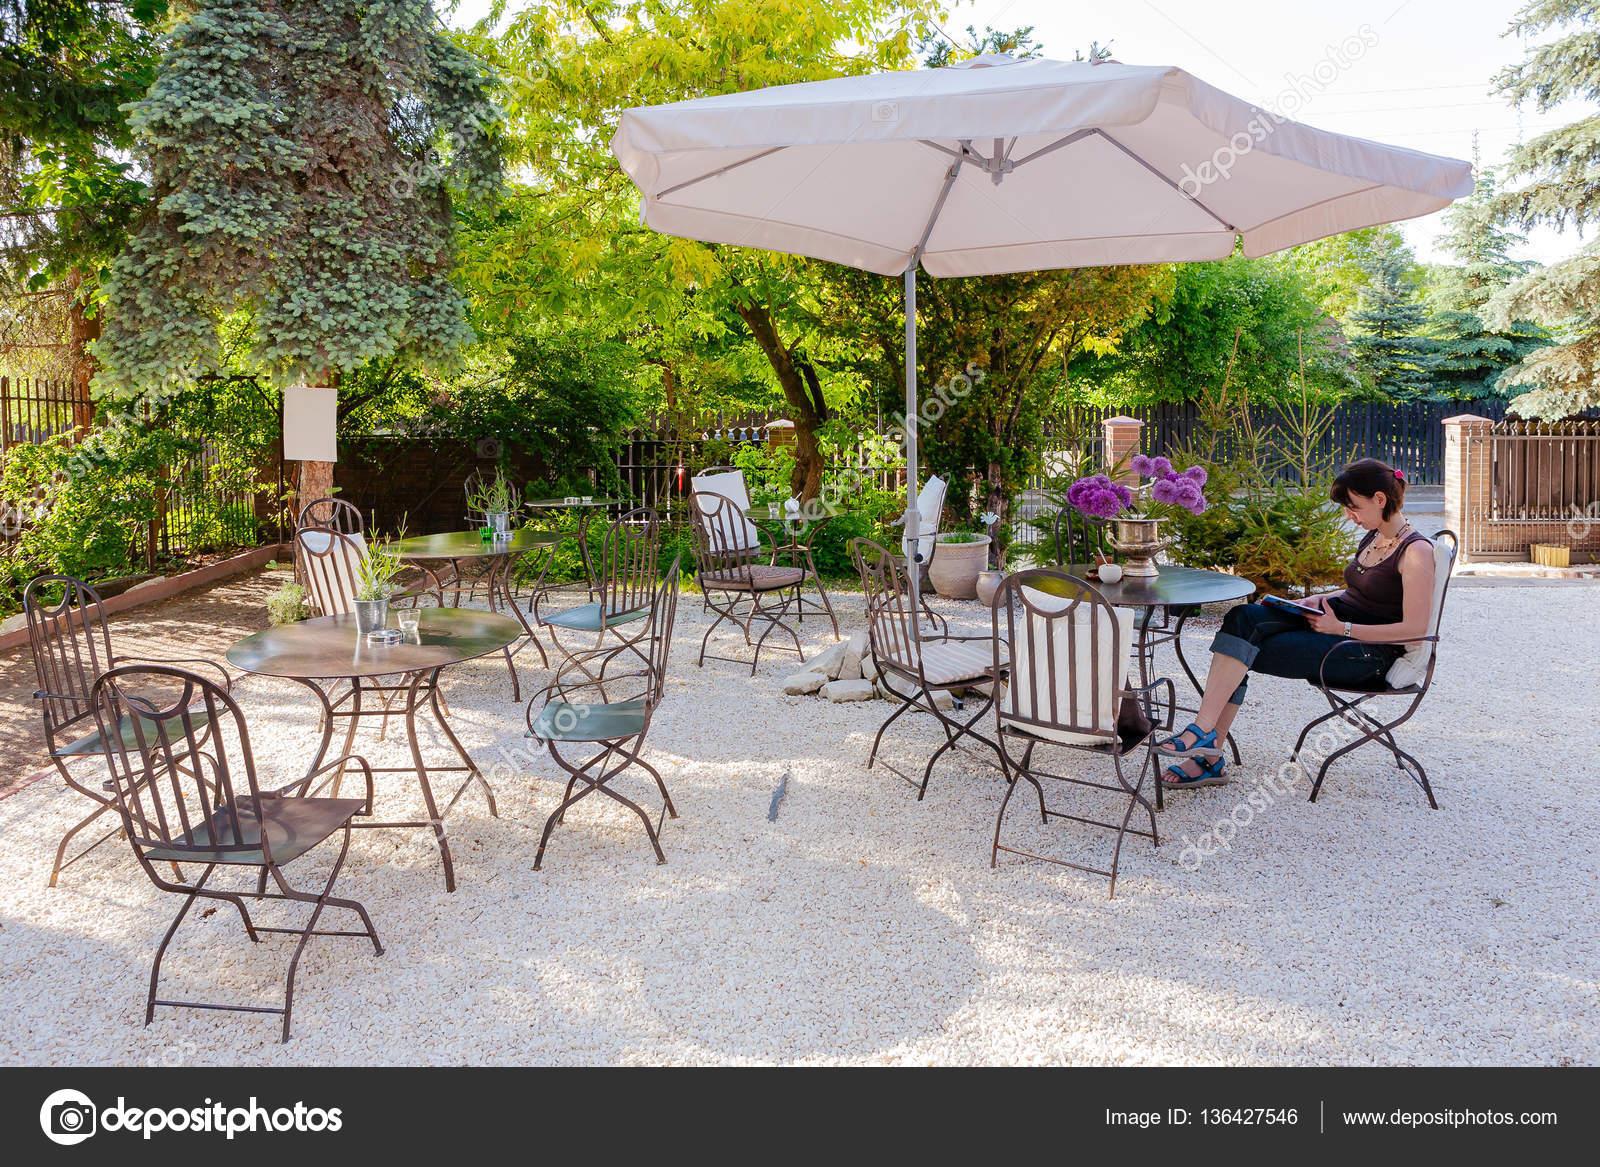 Tavoli e sedie di bar all 39 aperto foto stock bubutu 136427546 - Tavoli e sedie bar ...